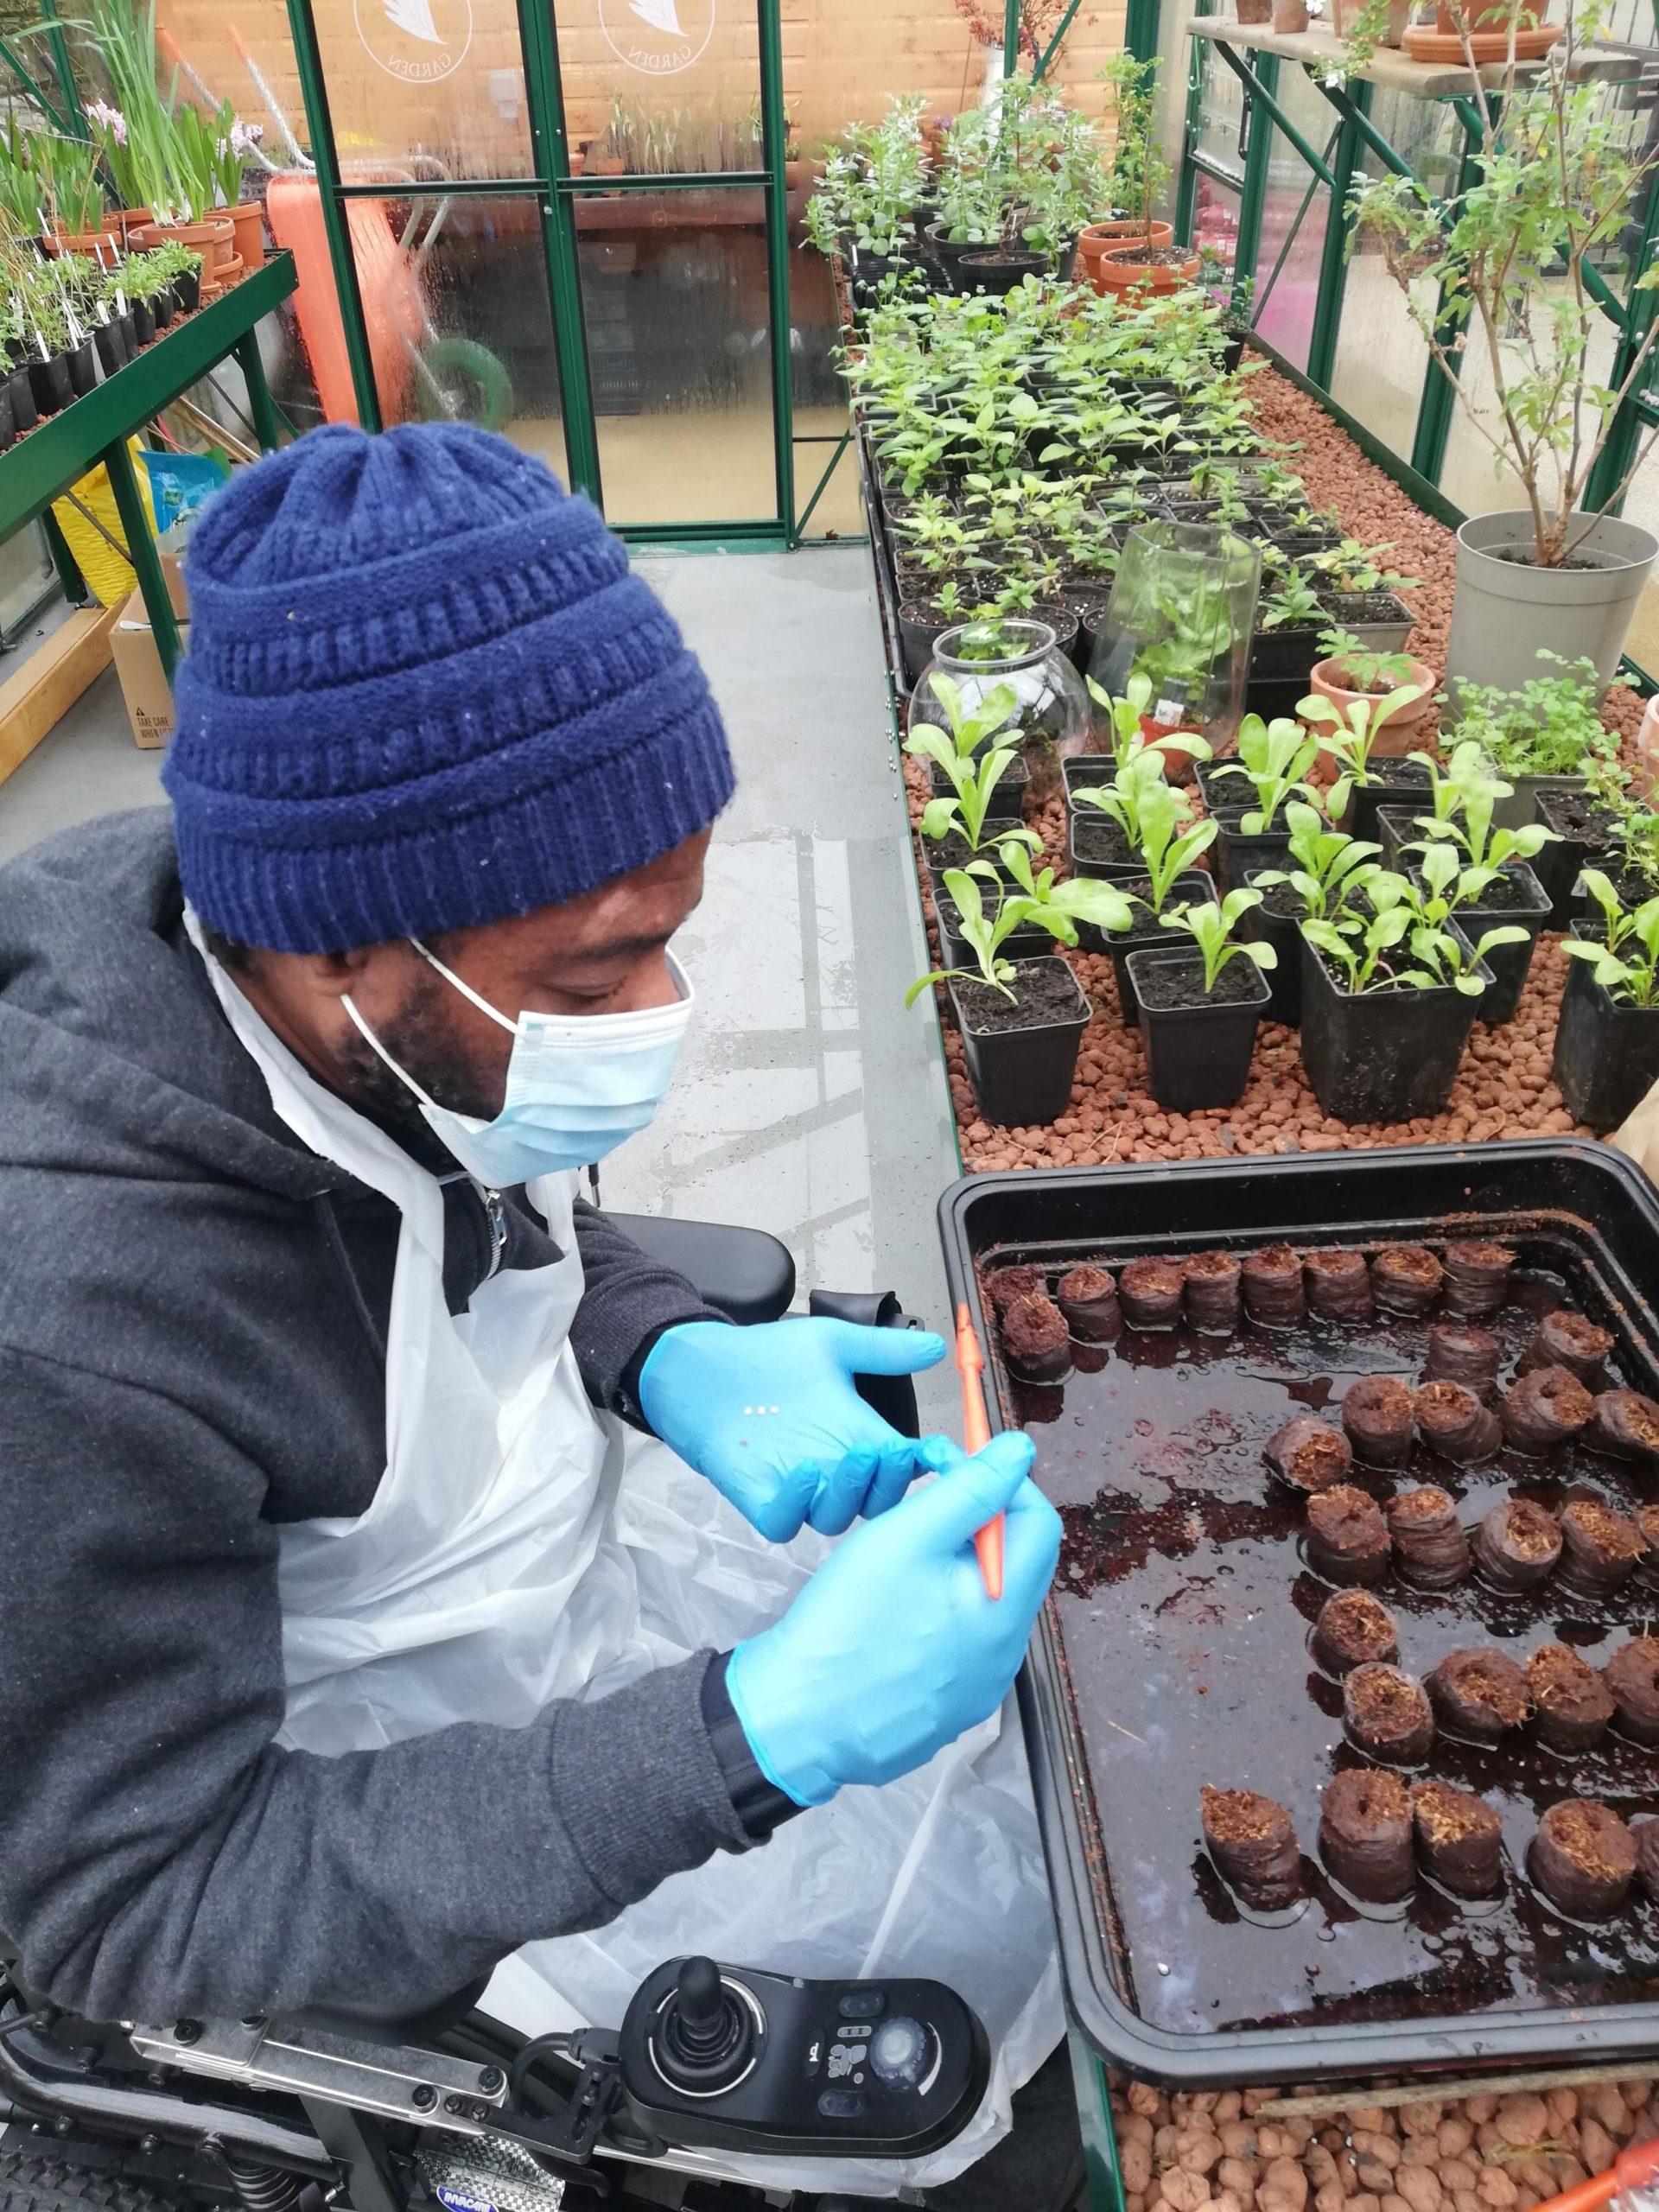 Curtis Planting Seeds